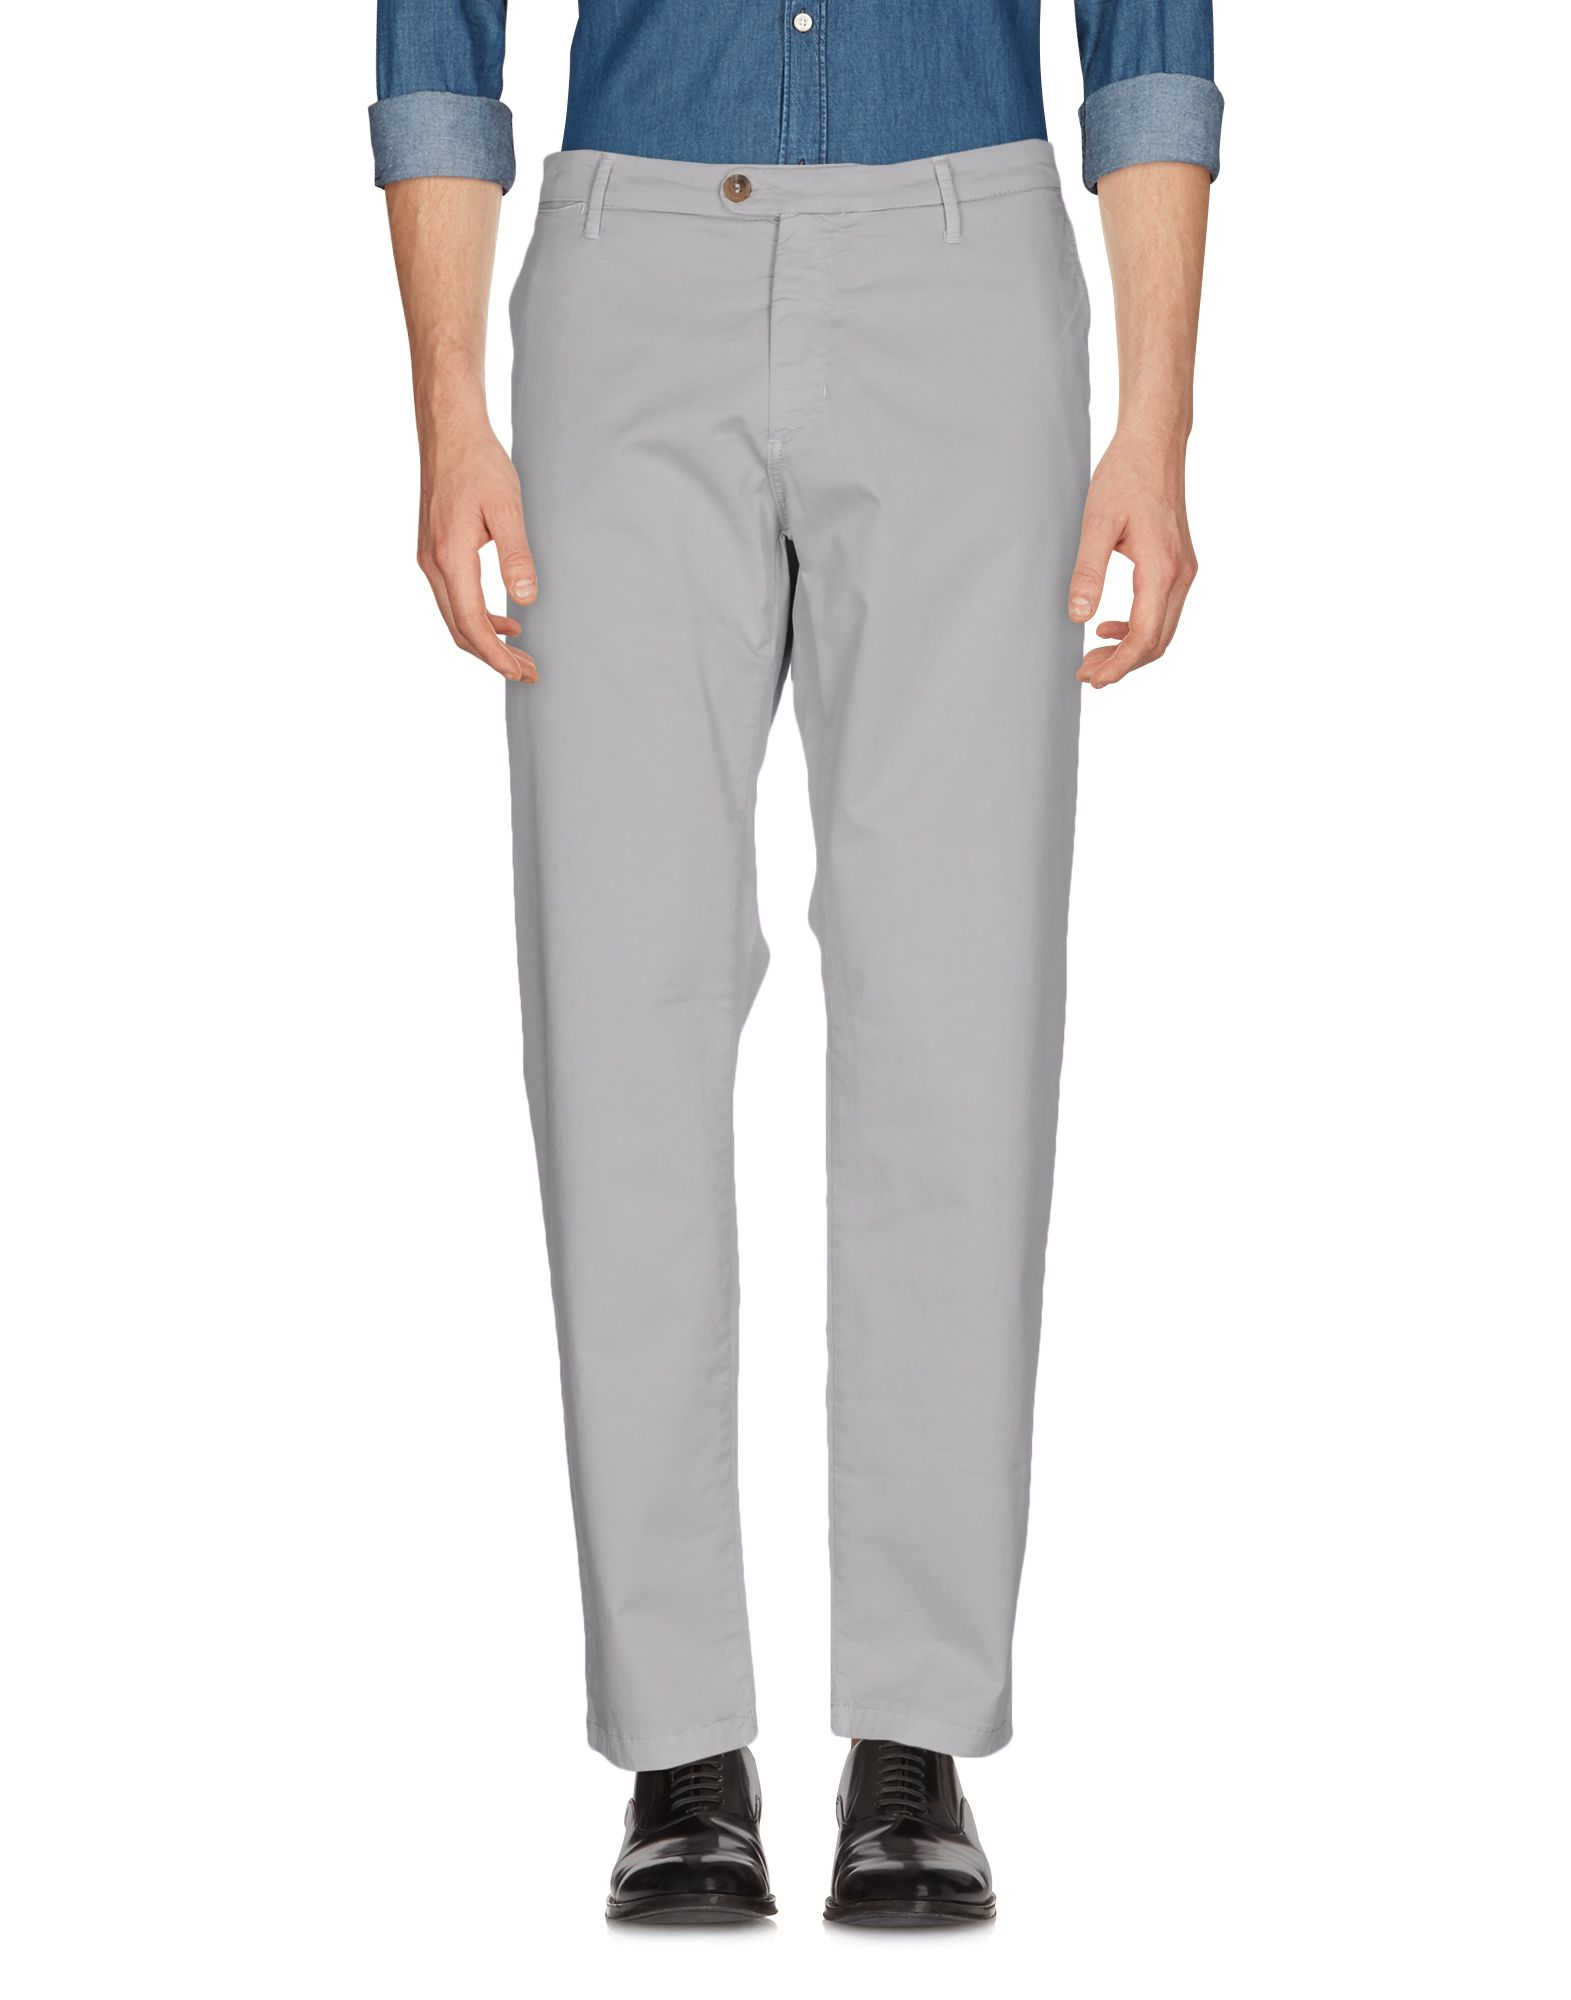 GIAN BERTONE Повседневные брюки gian marco venturi одежда 81g01